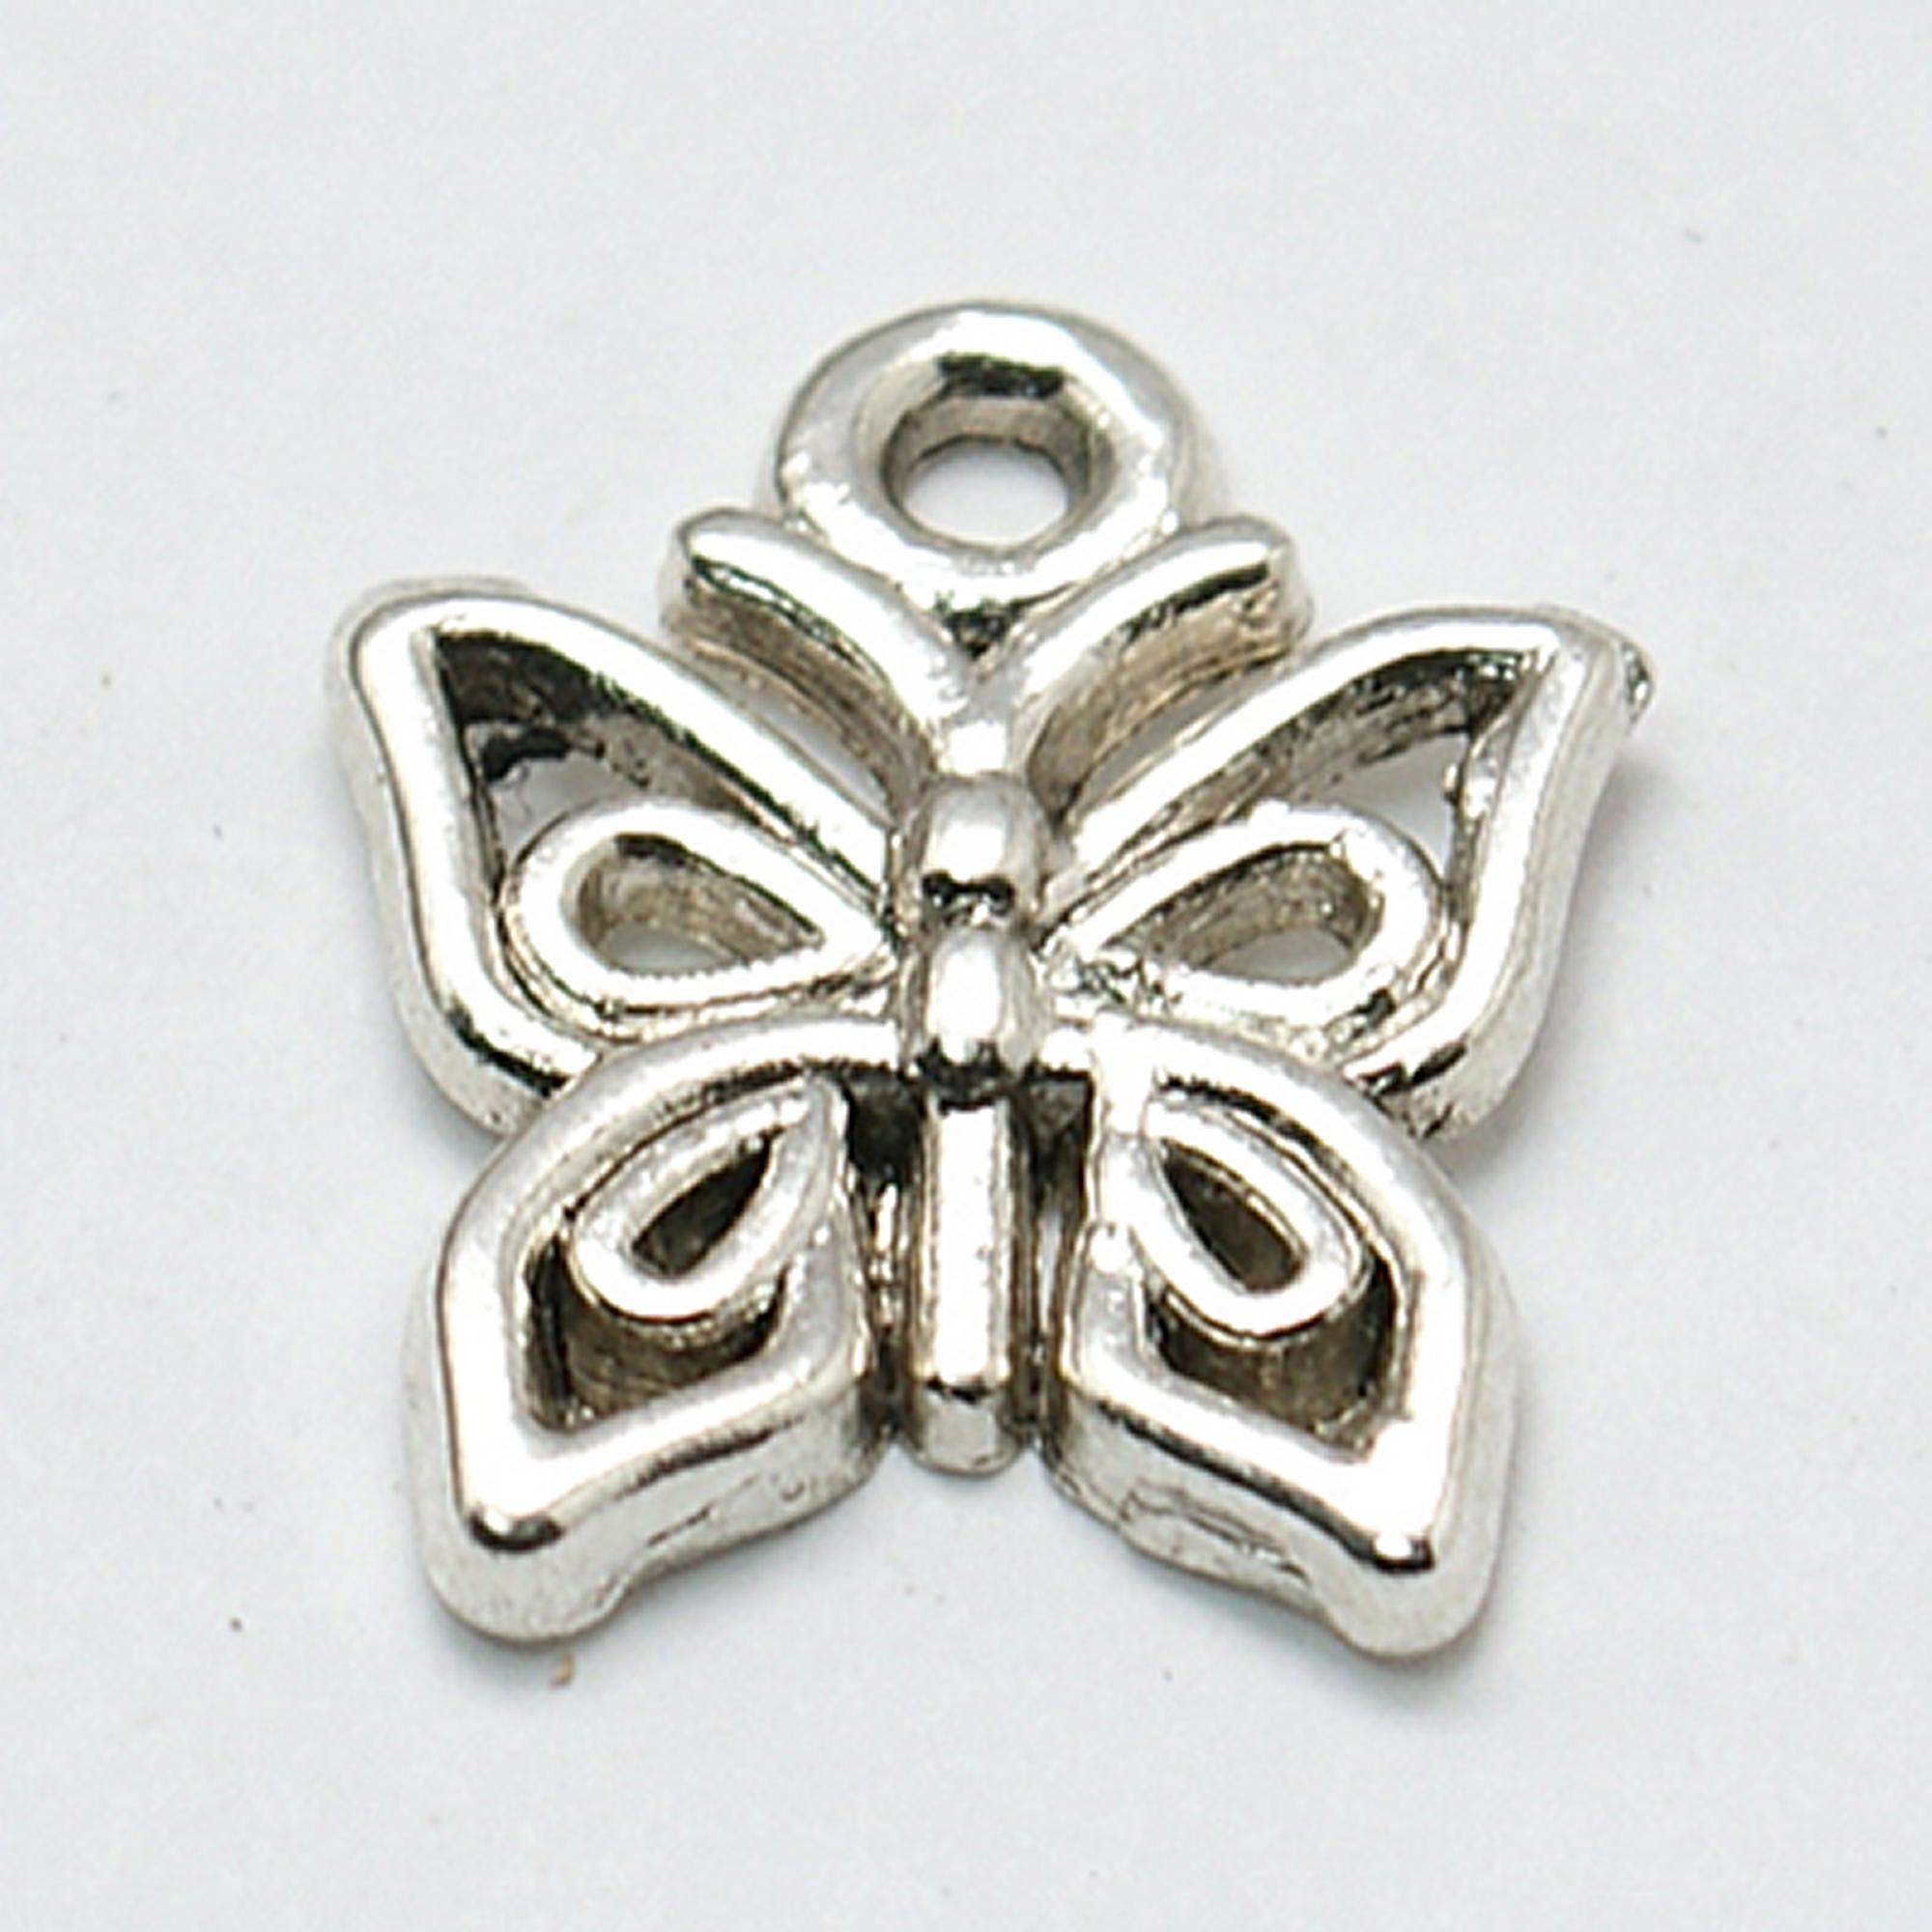 10g Approx 30pcs Tibetan Silver Colour Love Charm